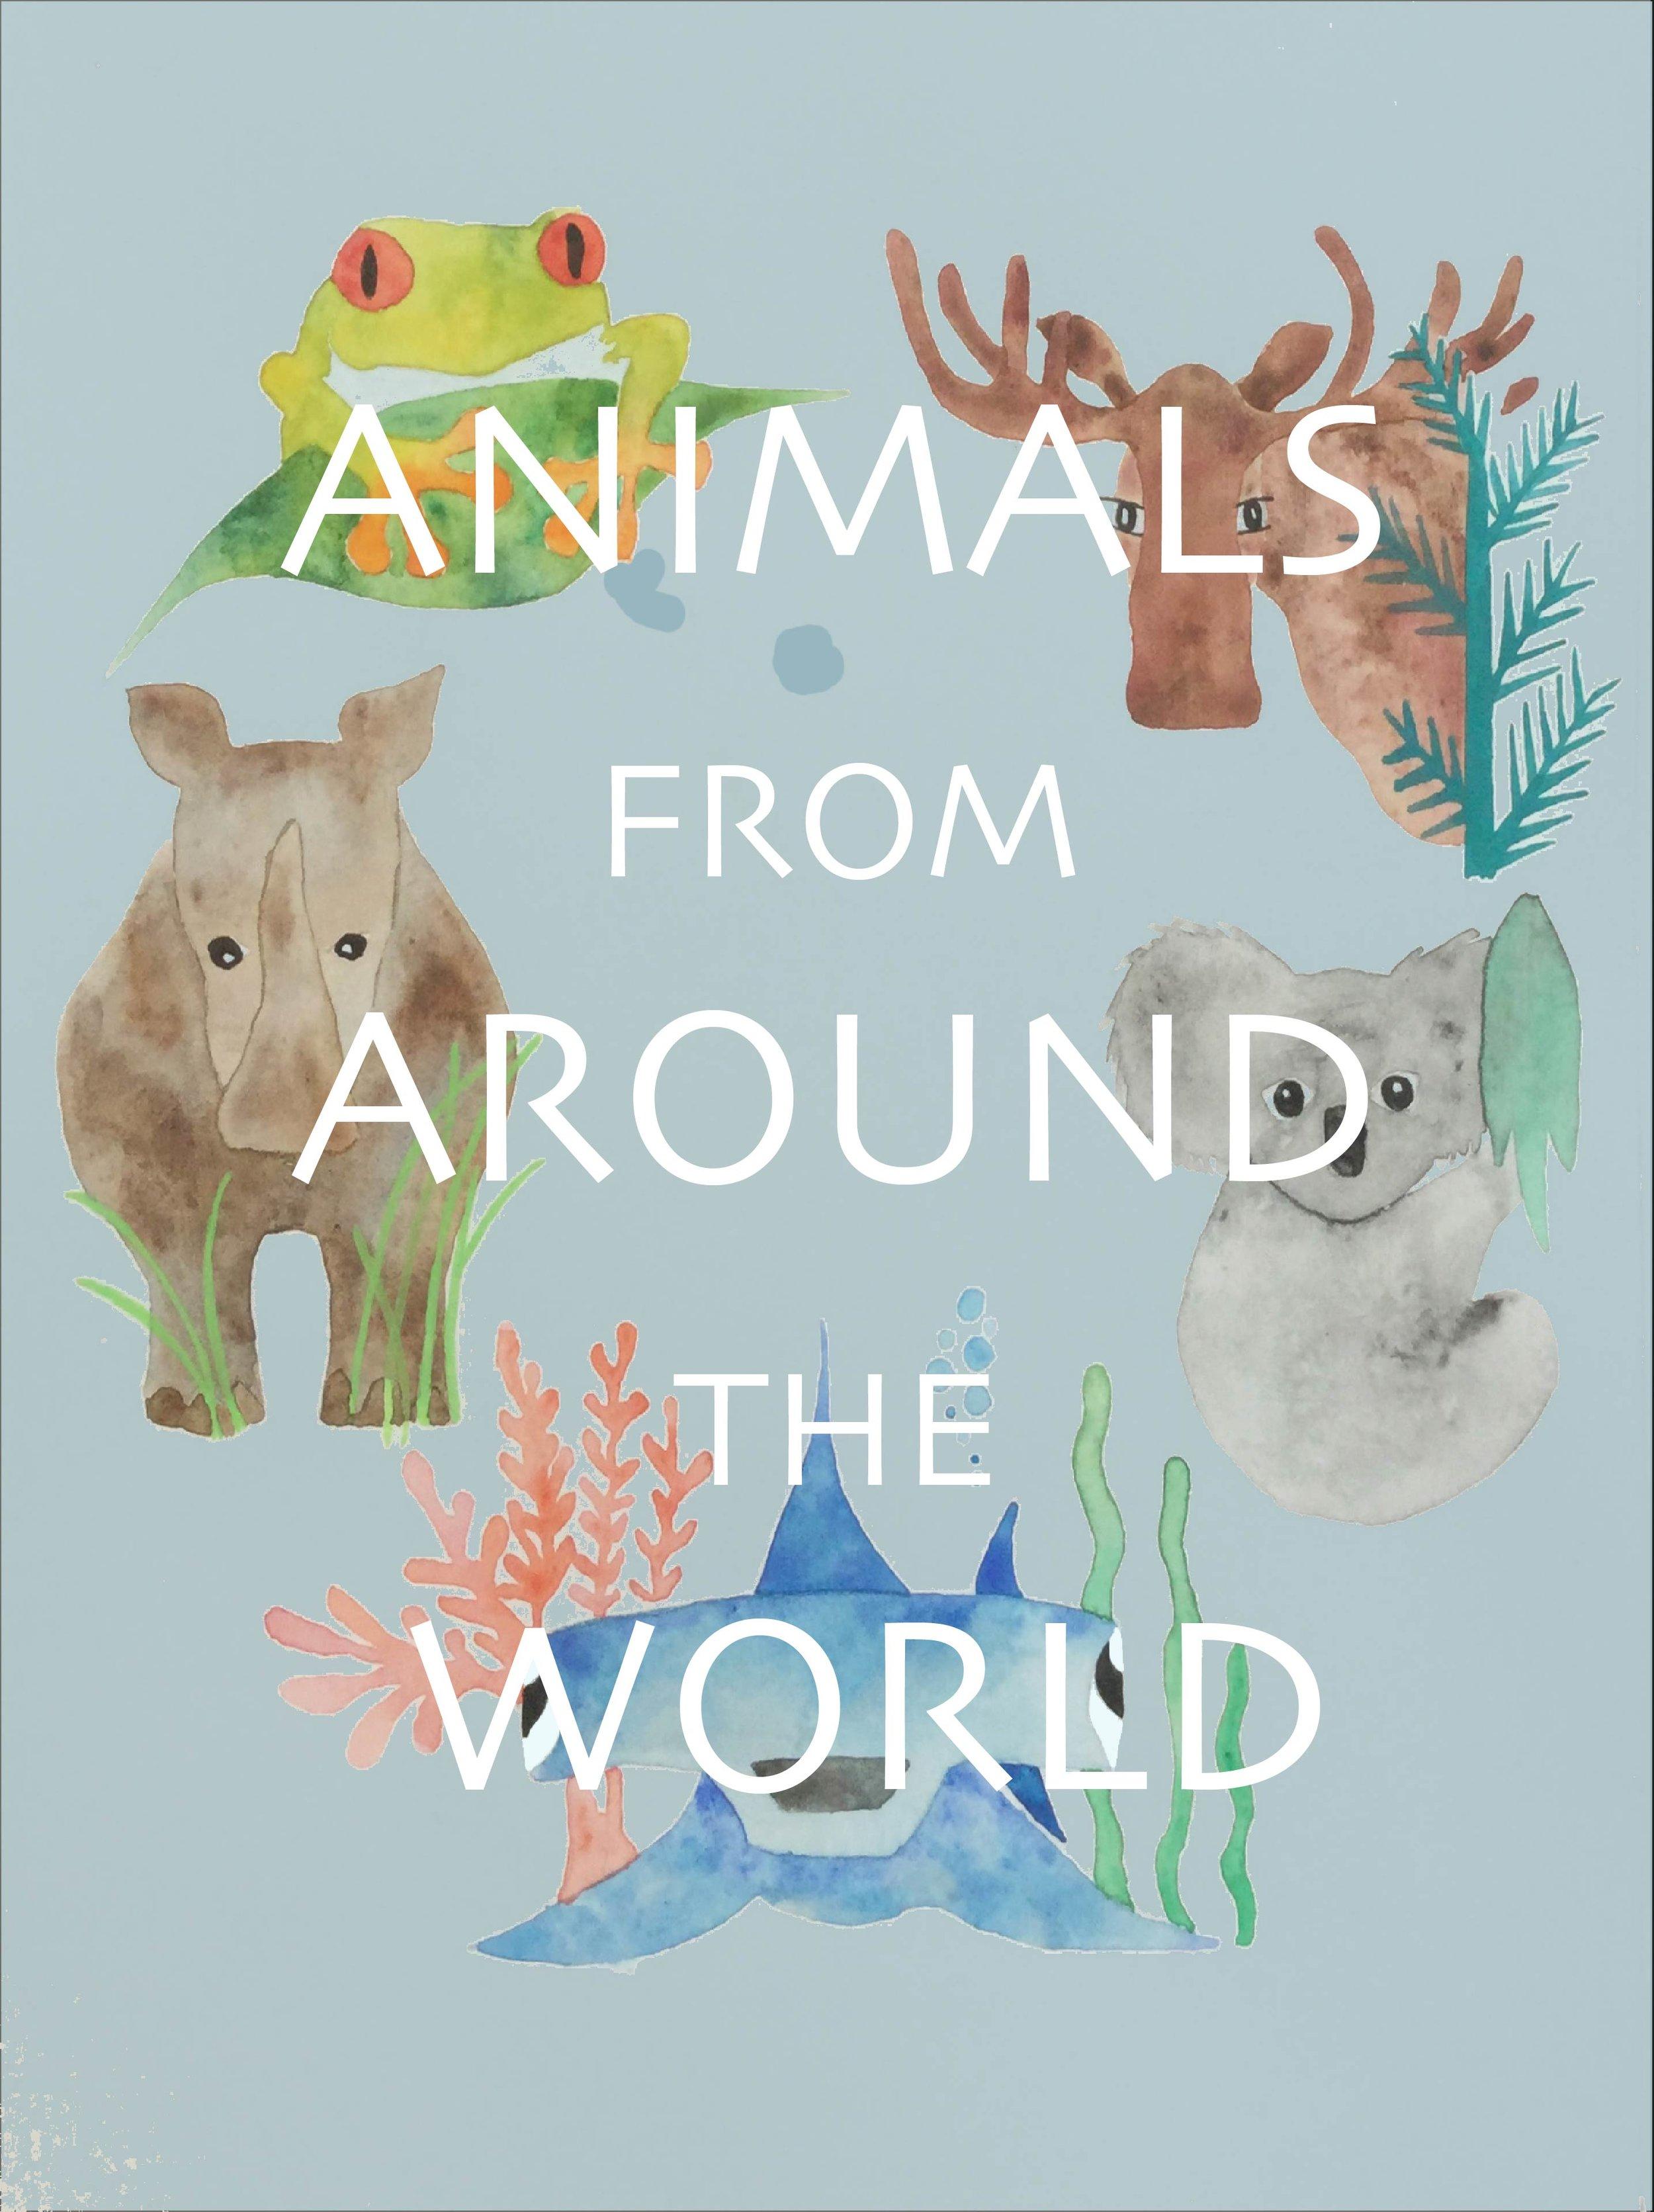 ANIMAL COVER 1H-01.jpg